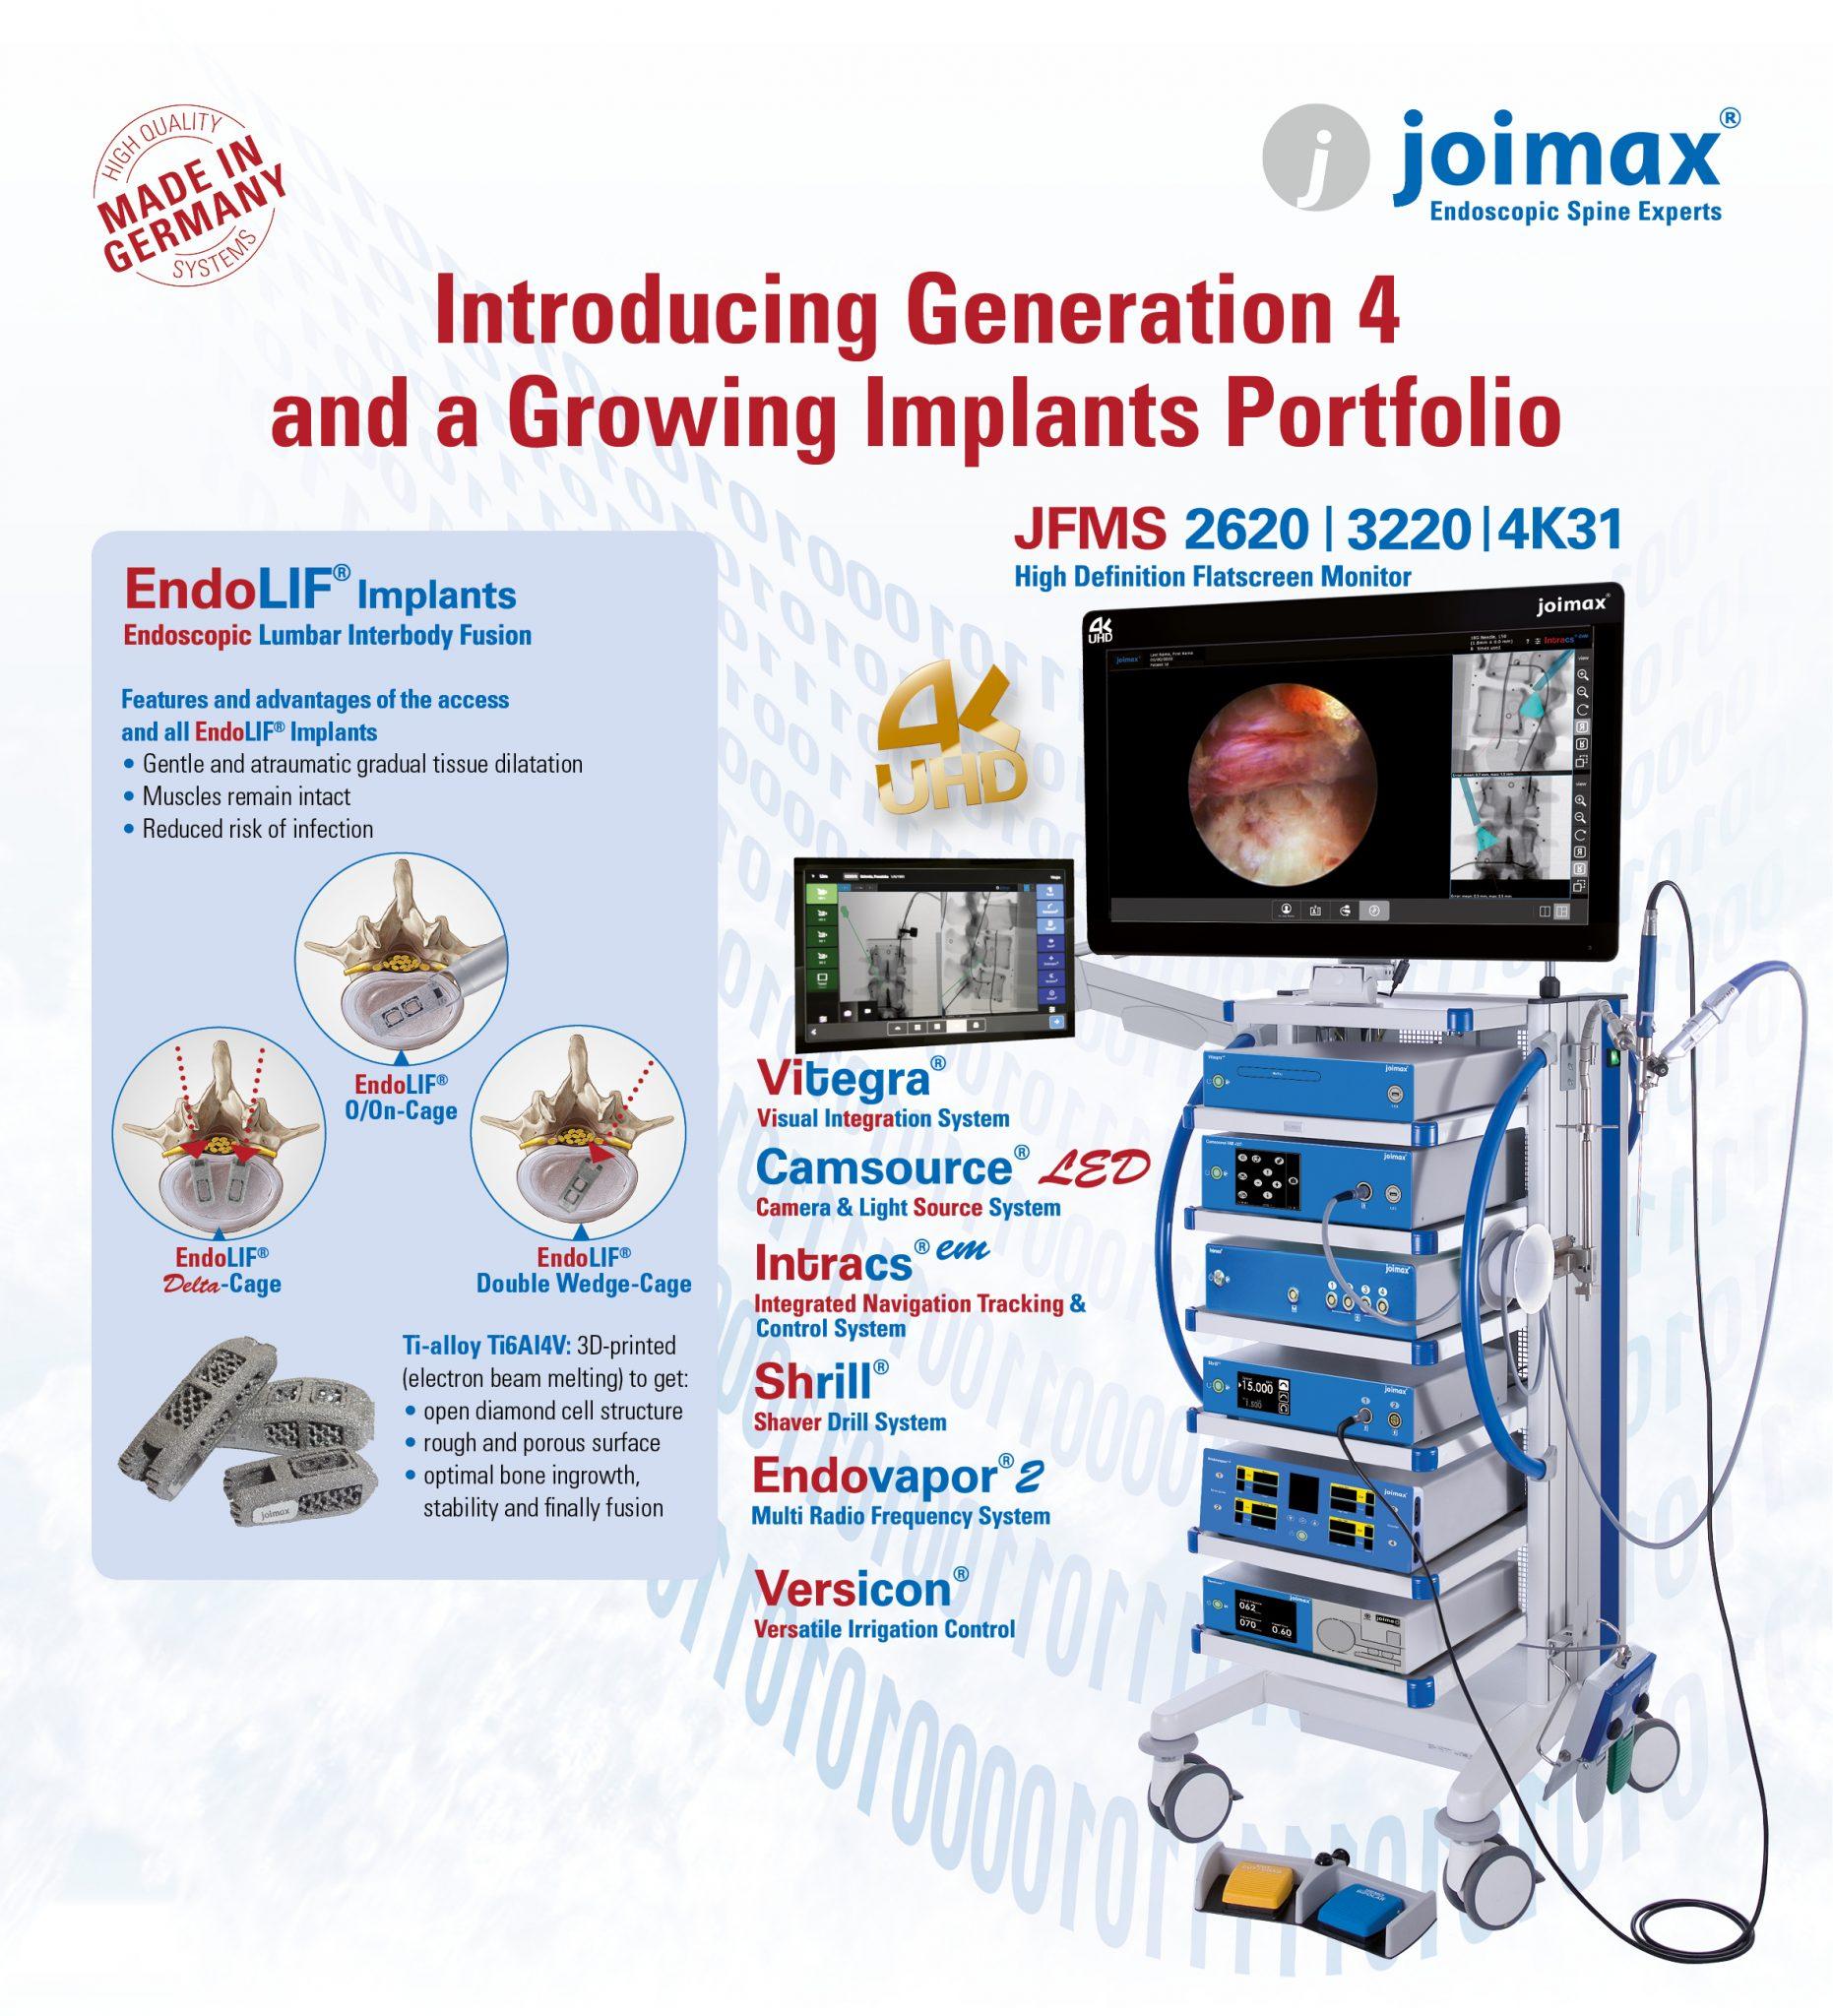 Joimax, Endoscopic spine surgery, Minimally invasive, Transforaminal, Interlaminar, Training and Education, EndoLIF Implants, Navigation, Generation4, next Generation, tower, endoscopic